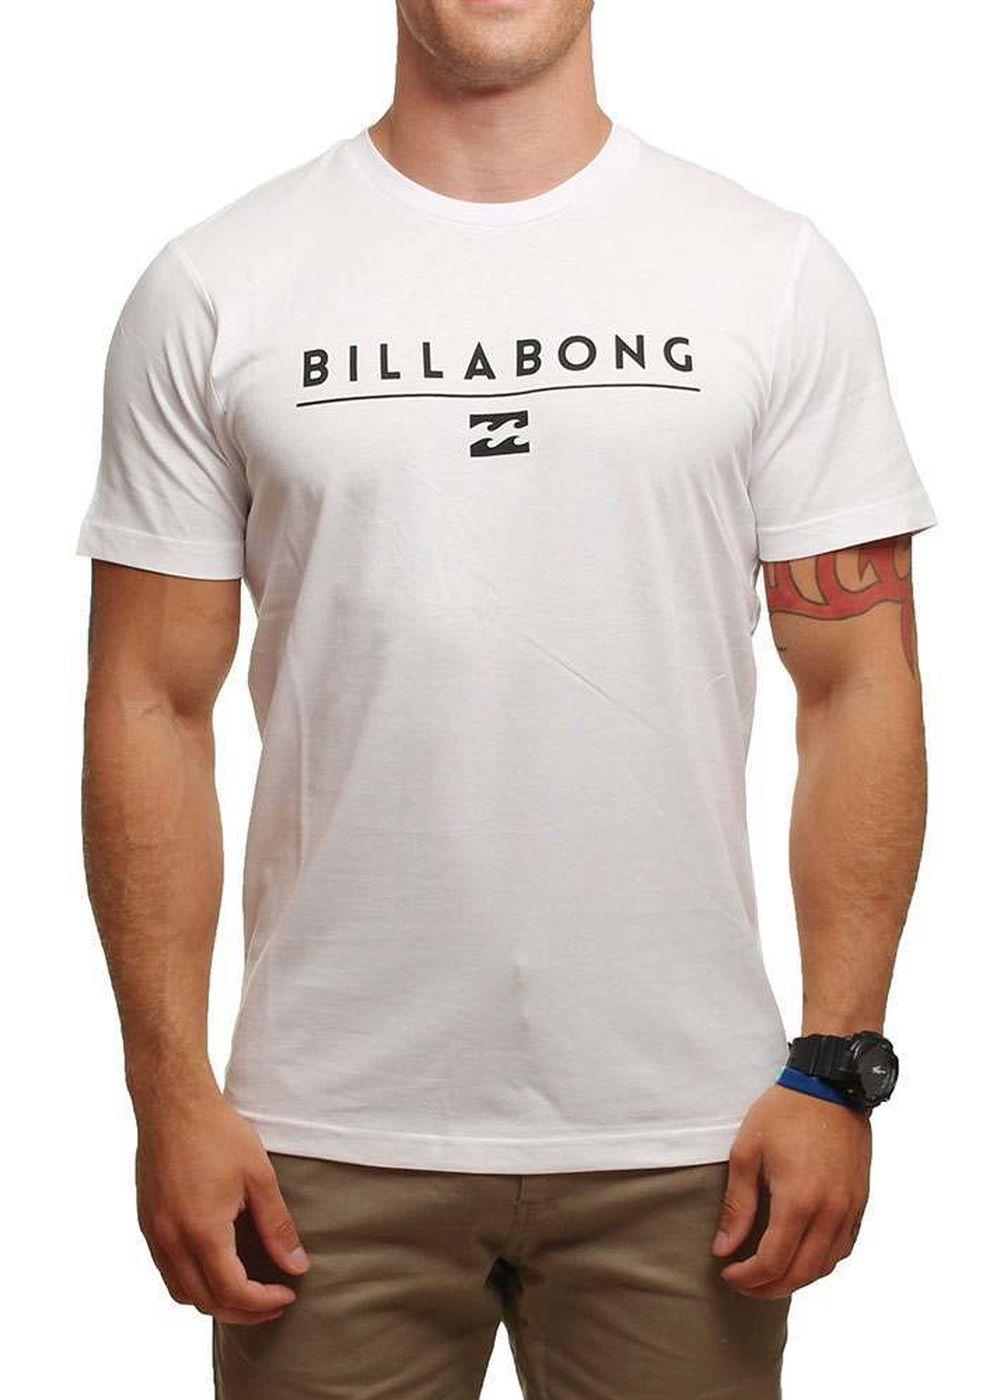 BILLABONG UNITY TEE White